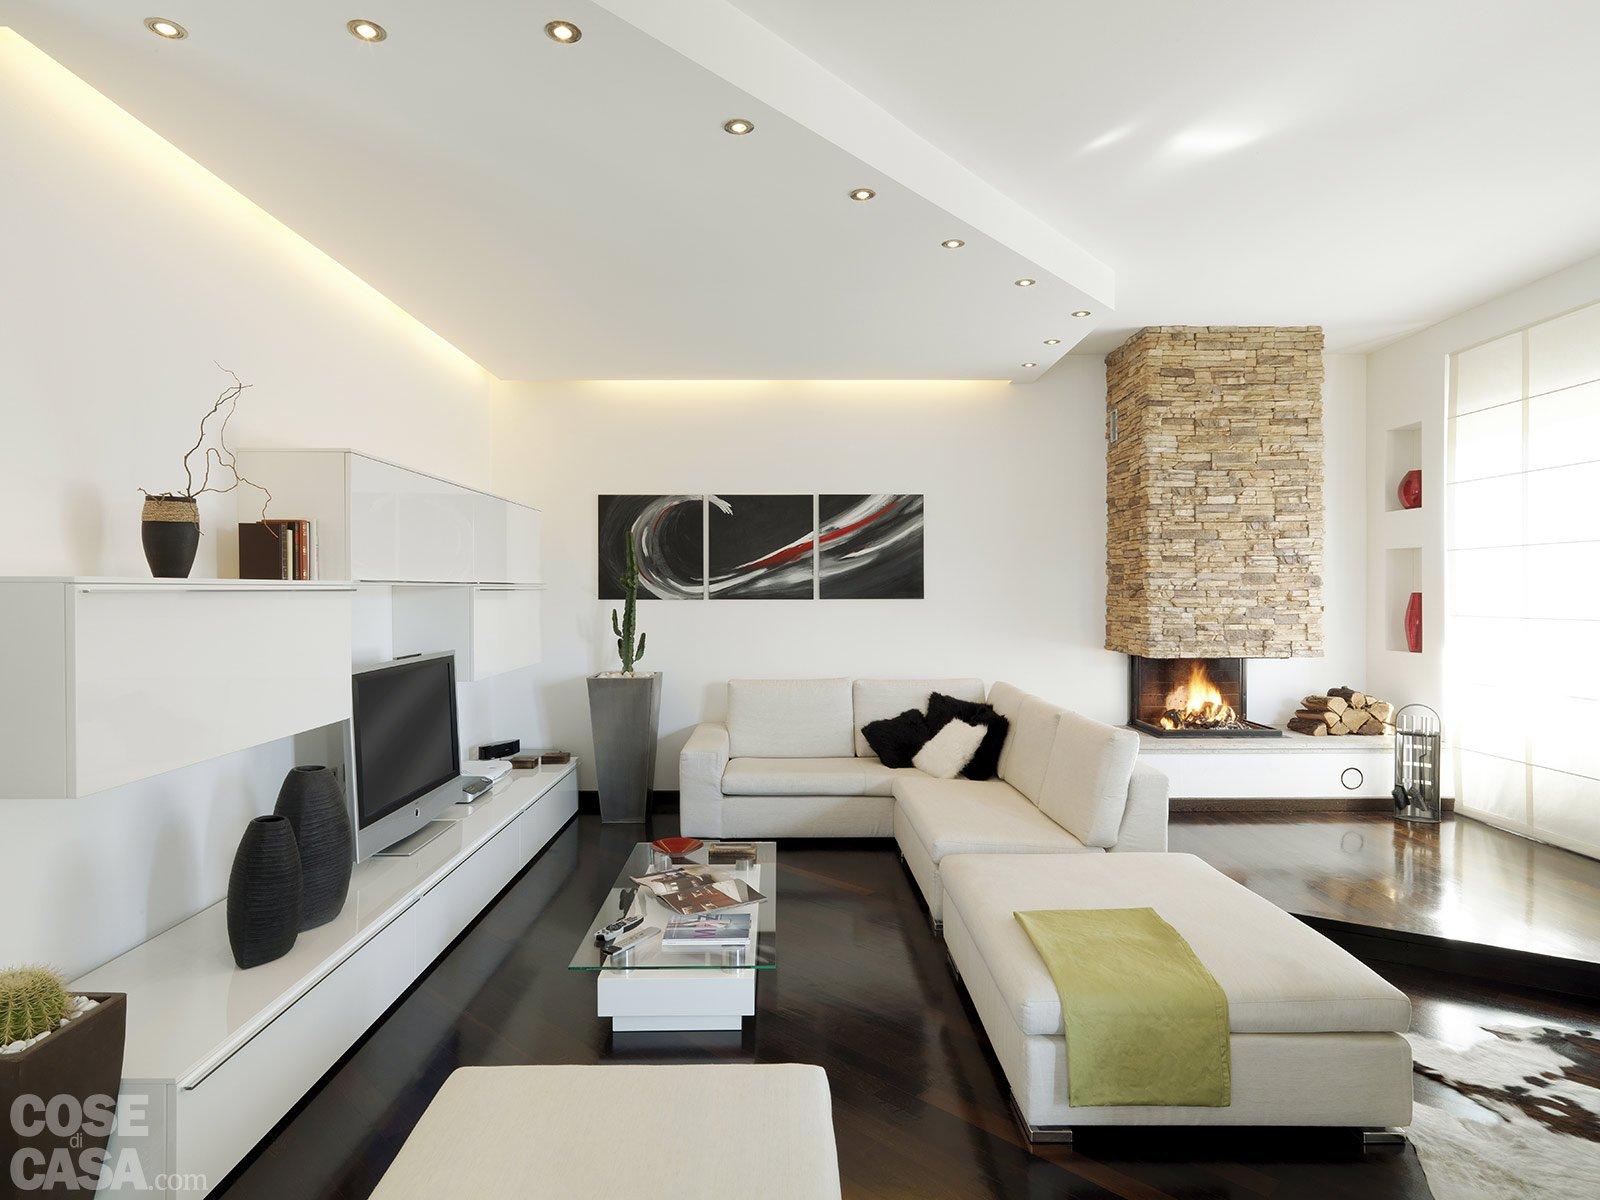 Una casa moderna su livelli sfalsati cose di casa for Interni case classiche